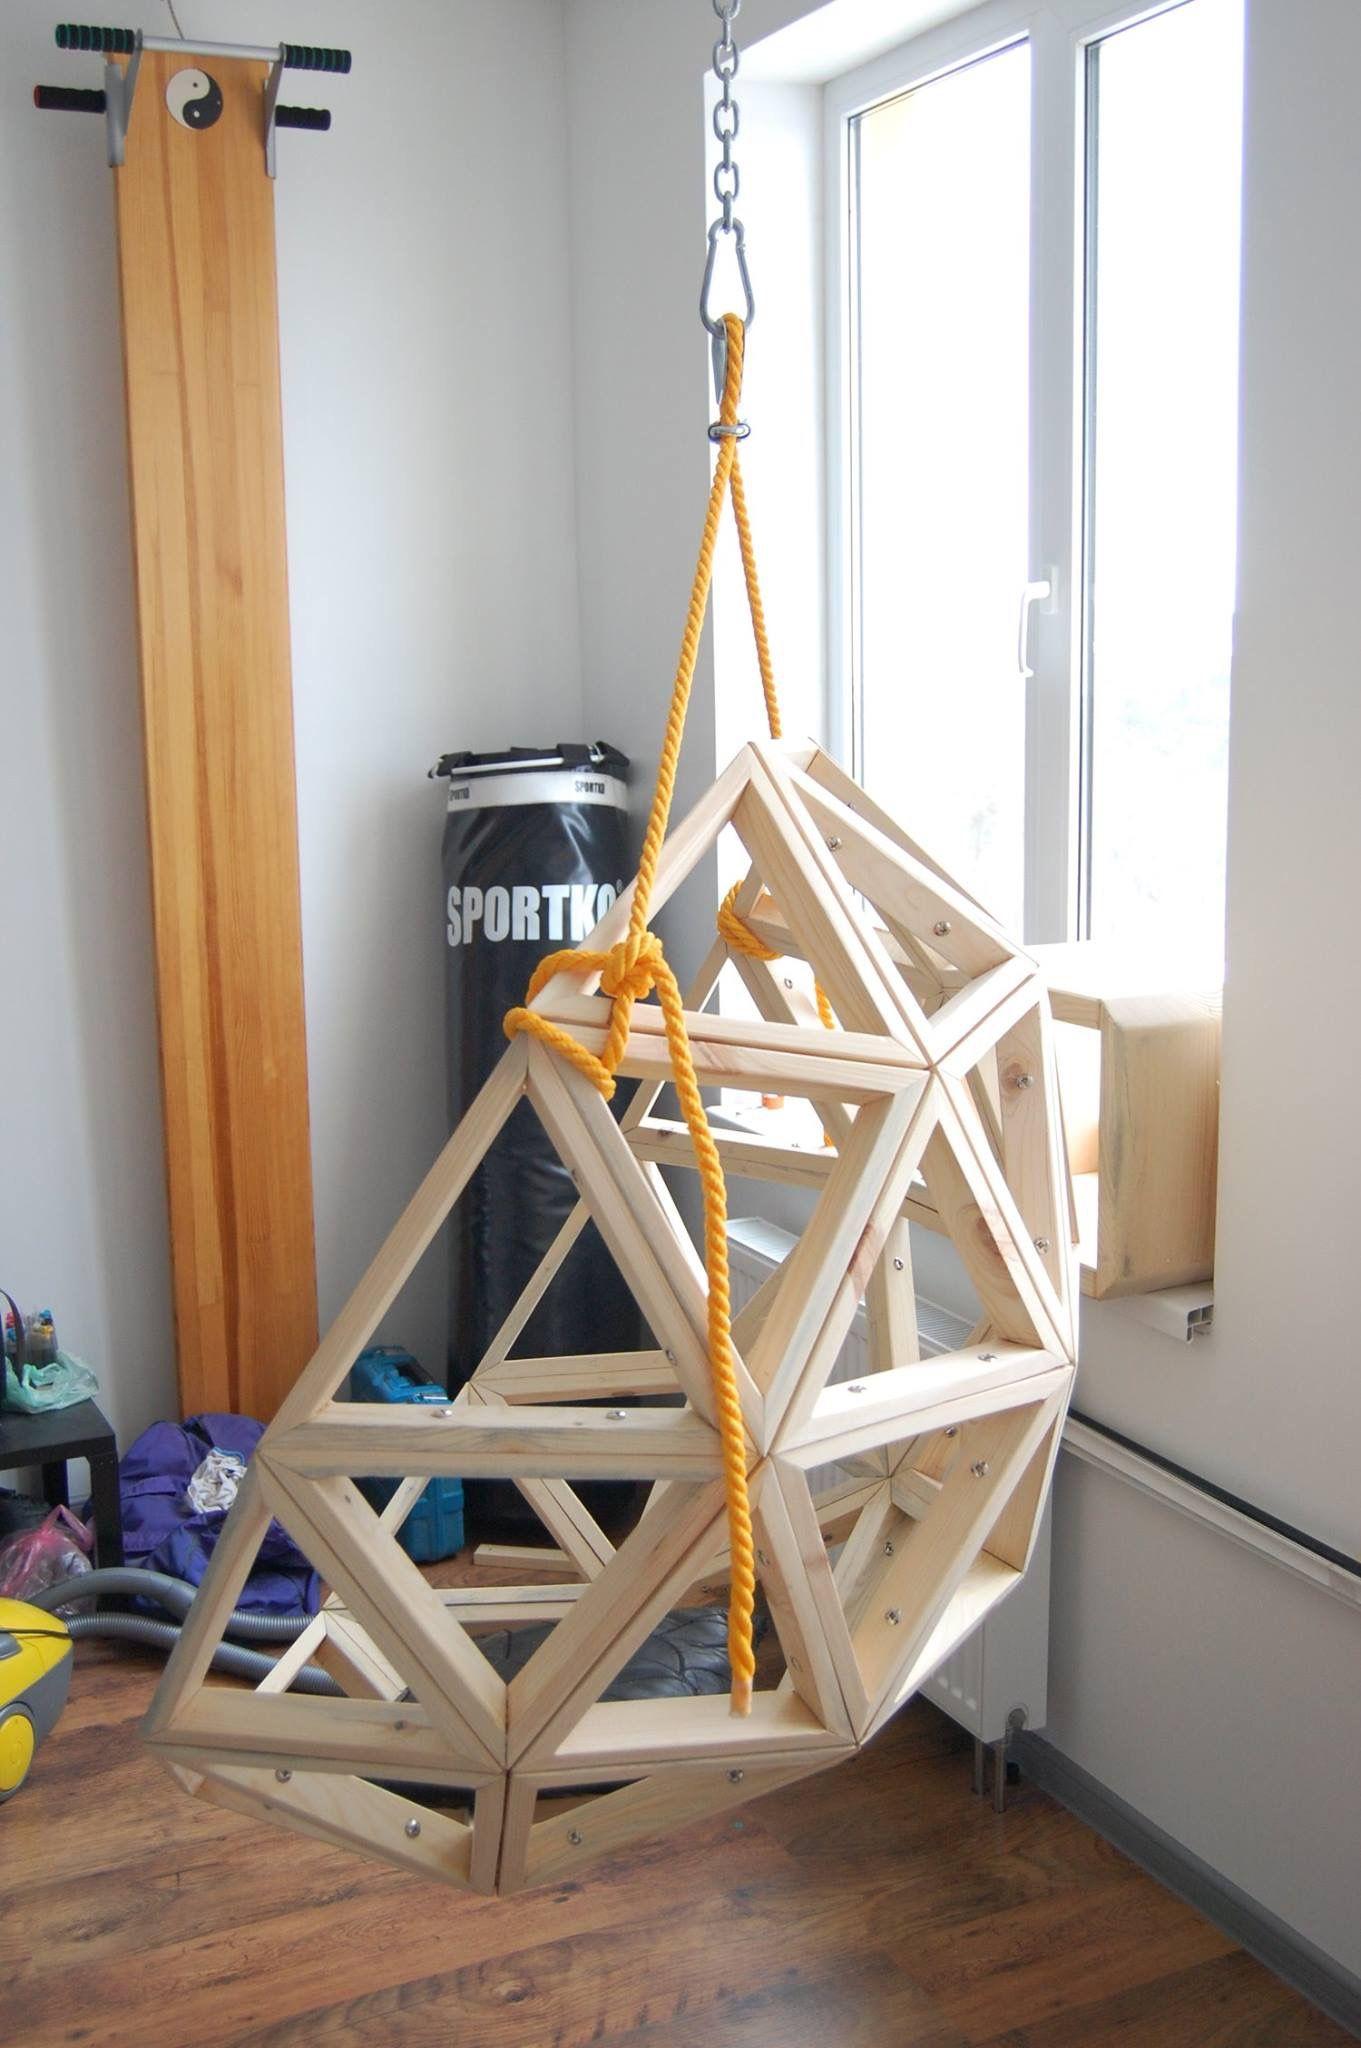 Quejlaverga chino de madera deco en 2019 trabajo - Mesa plegable diseno ...